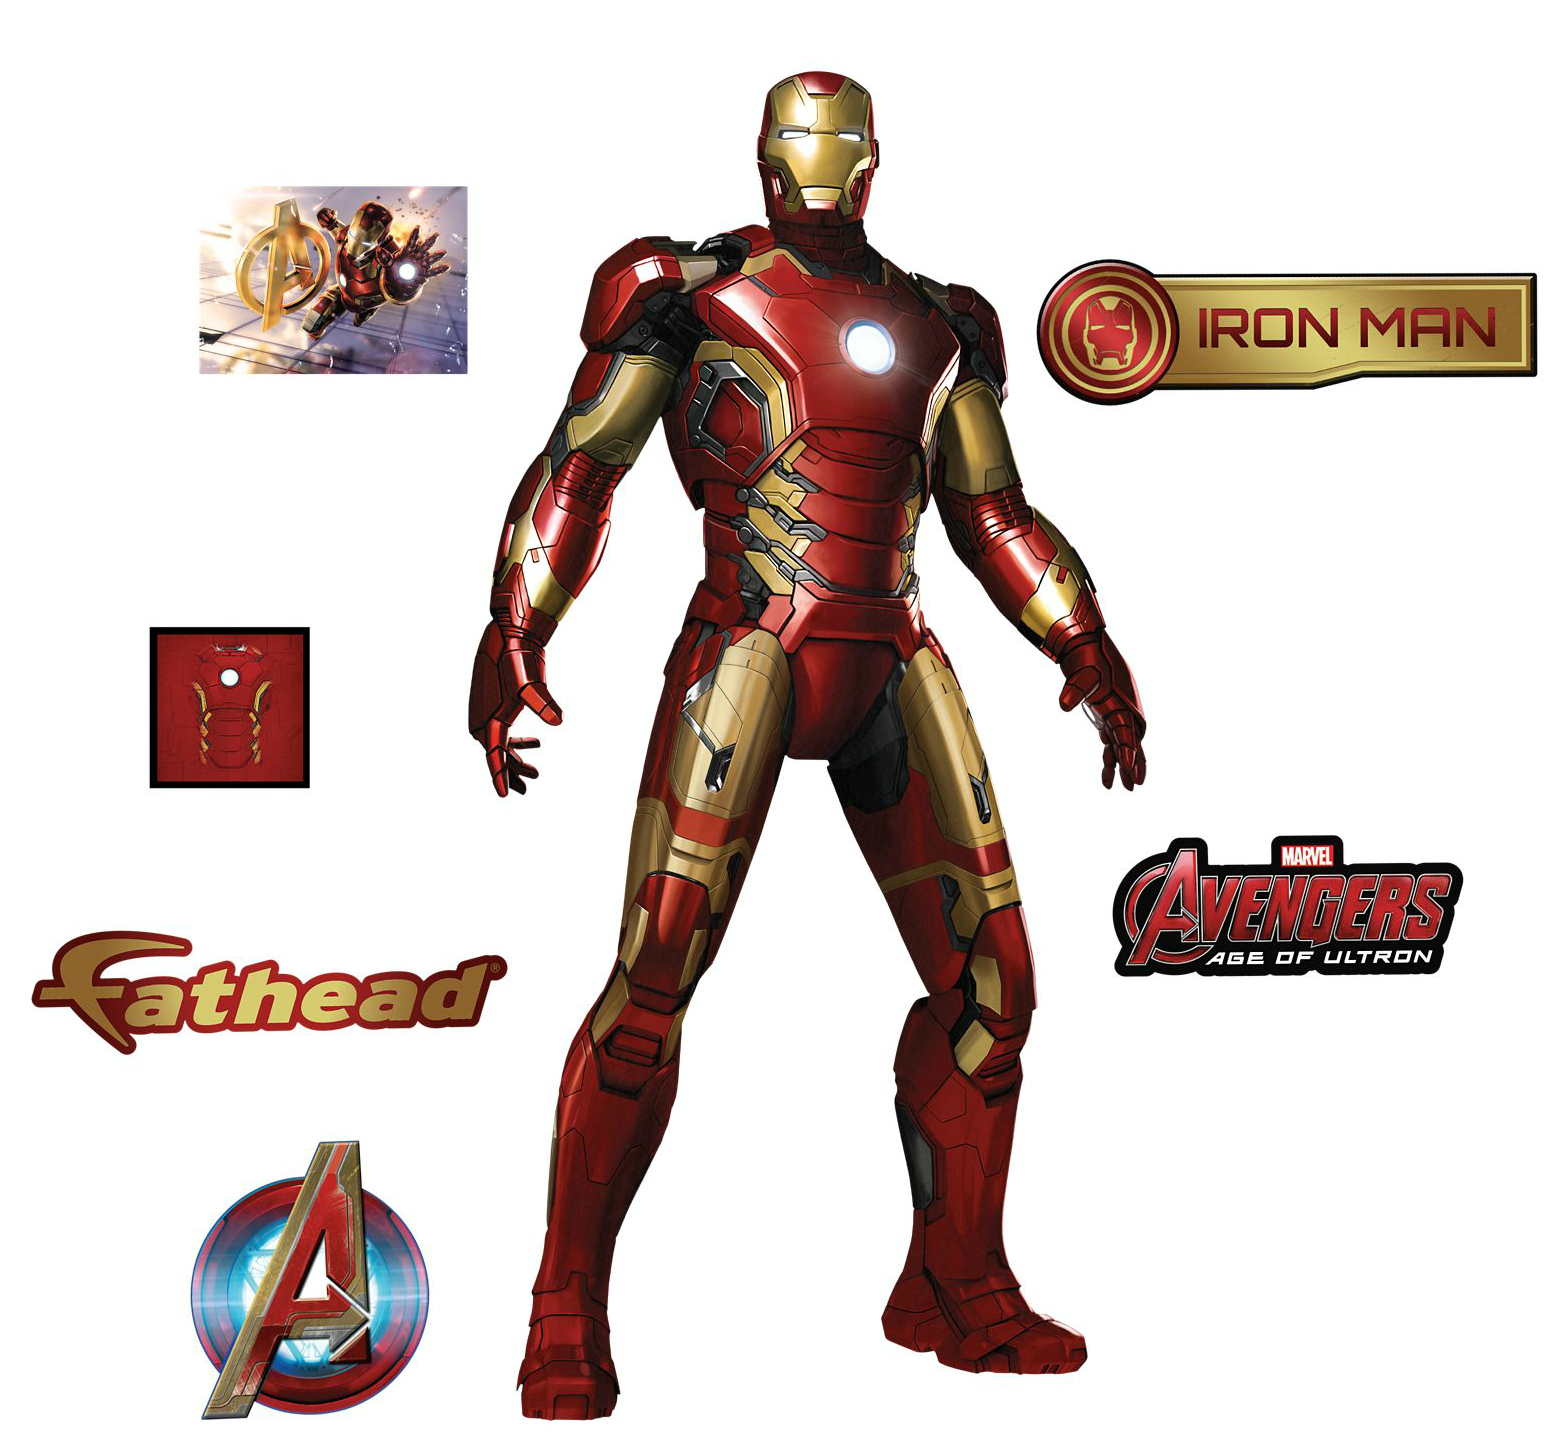 The Avengers Age of Ultron Hulk Avengers Age of Ultron Iron